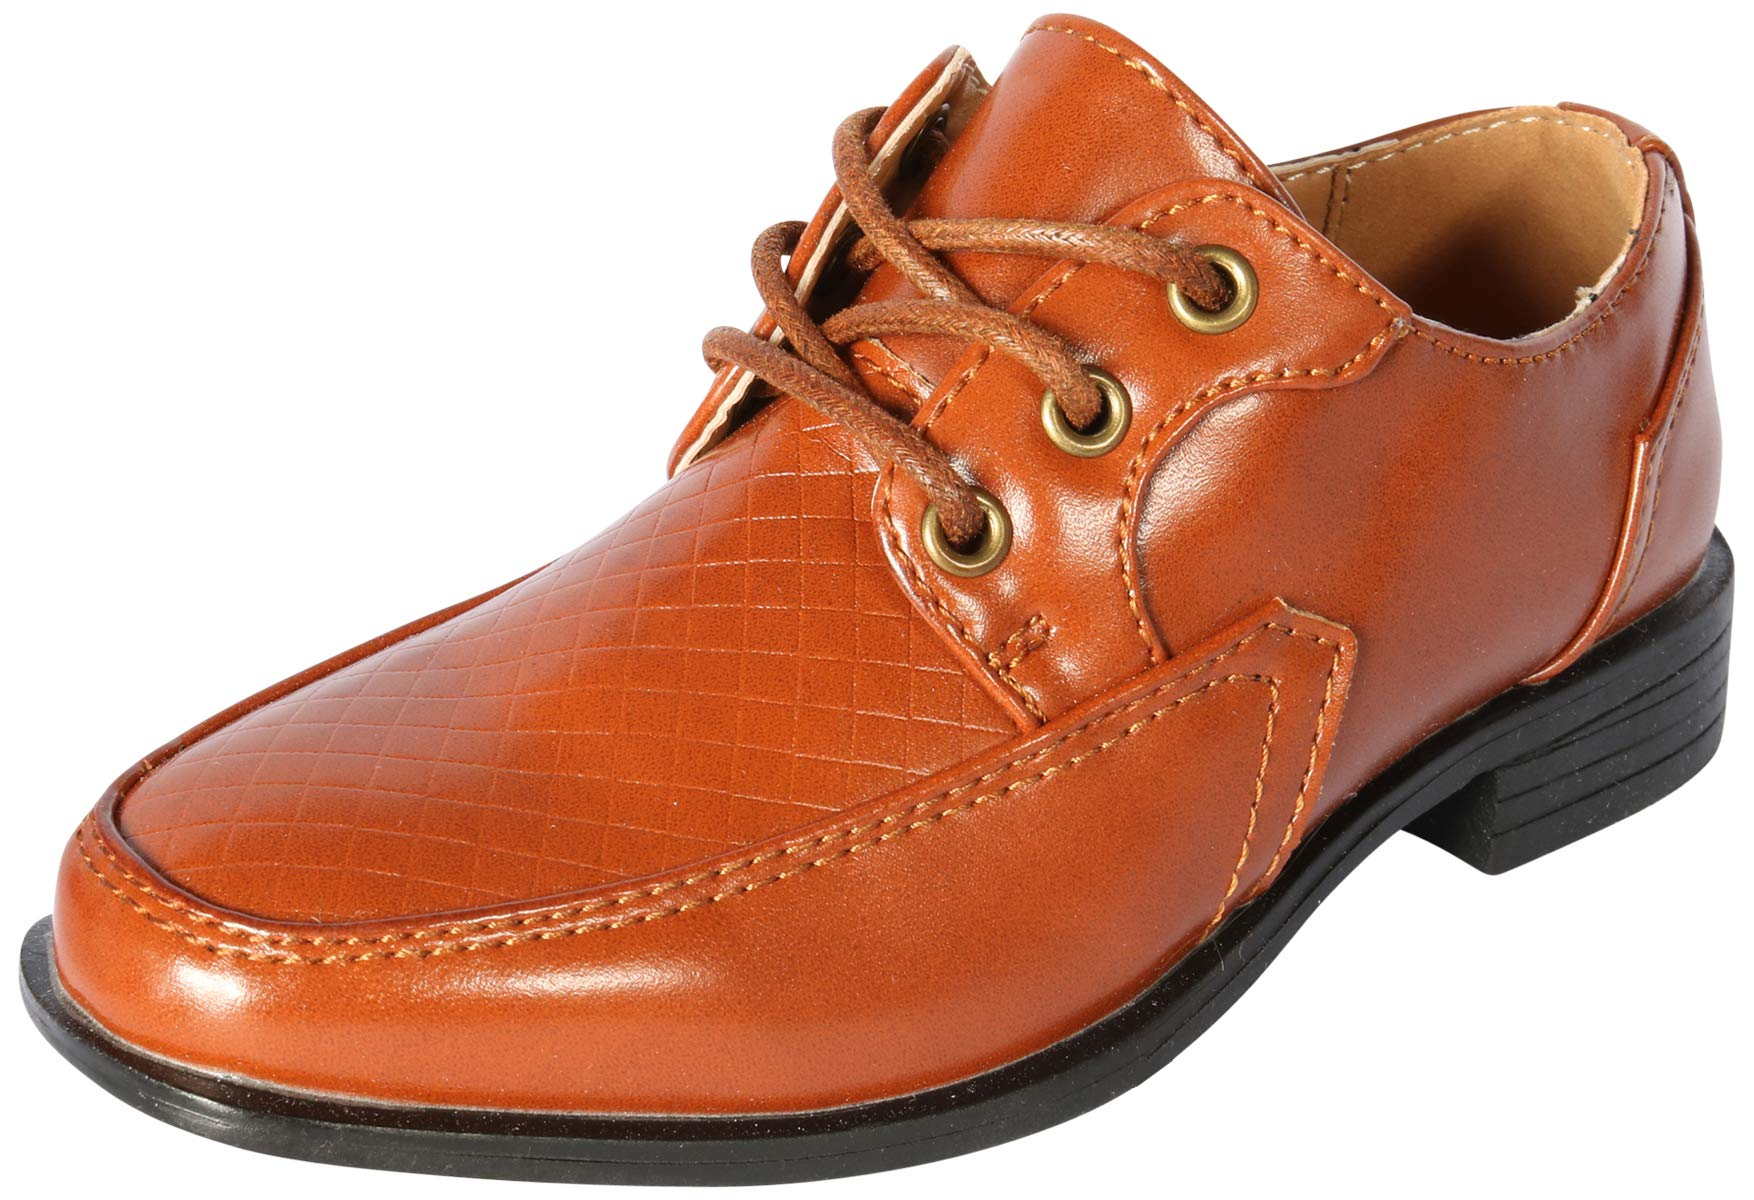 Jodano Collection Boys Memory Foam Lace up Dress Shoe, Cognac, 11 M US Little Kid'